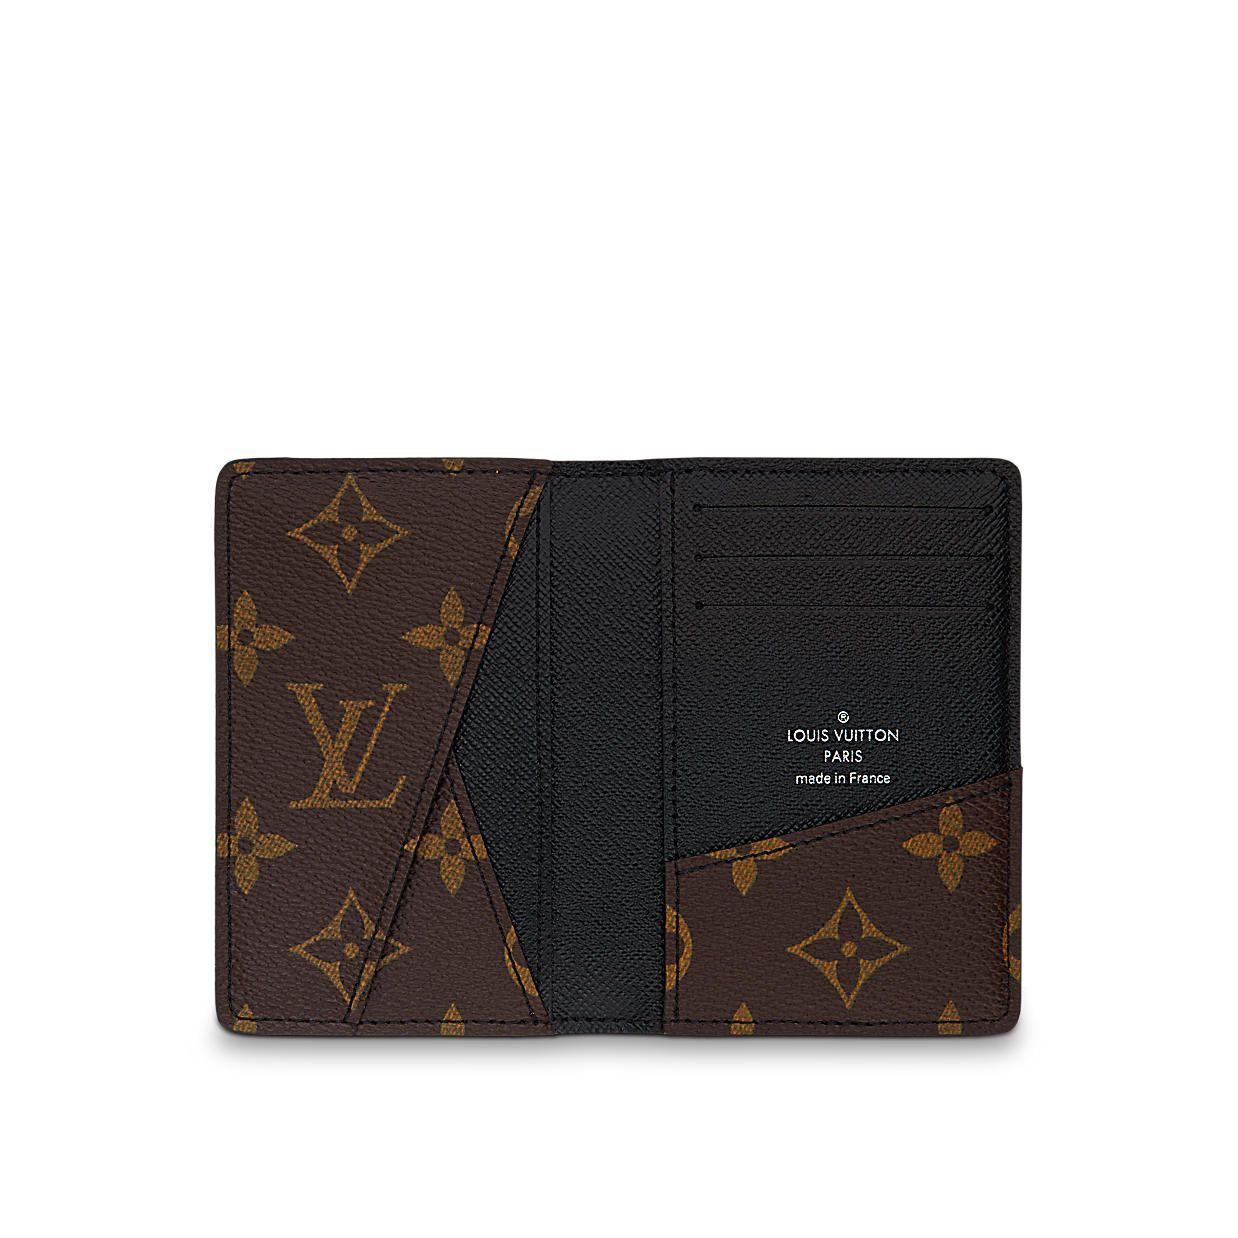 c81cee6a4eaf3 Discover Louis Vuitton Pocket Organiser  In elegant Monogram Macassar  canvas